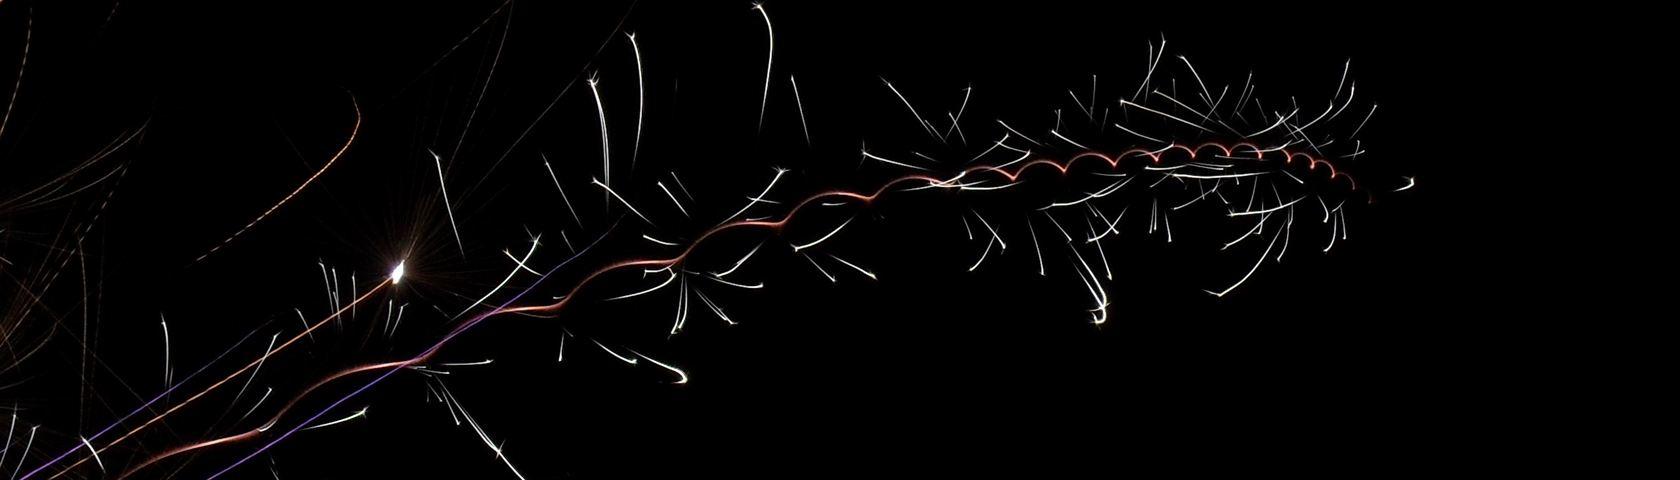 Spiral Fireworks